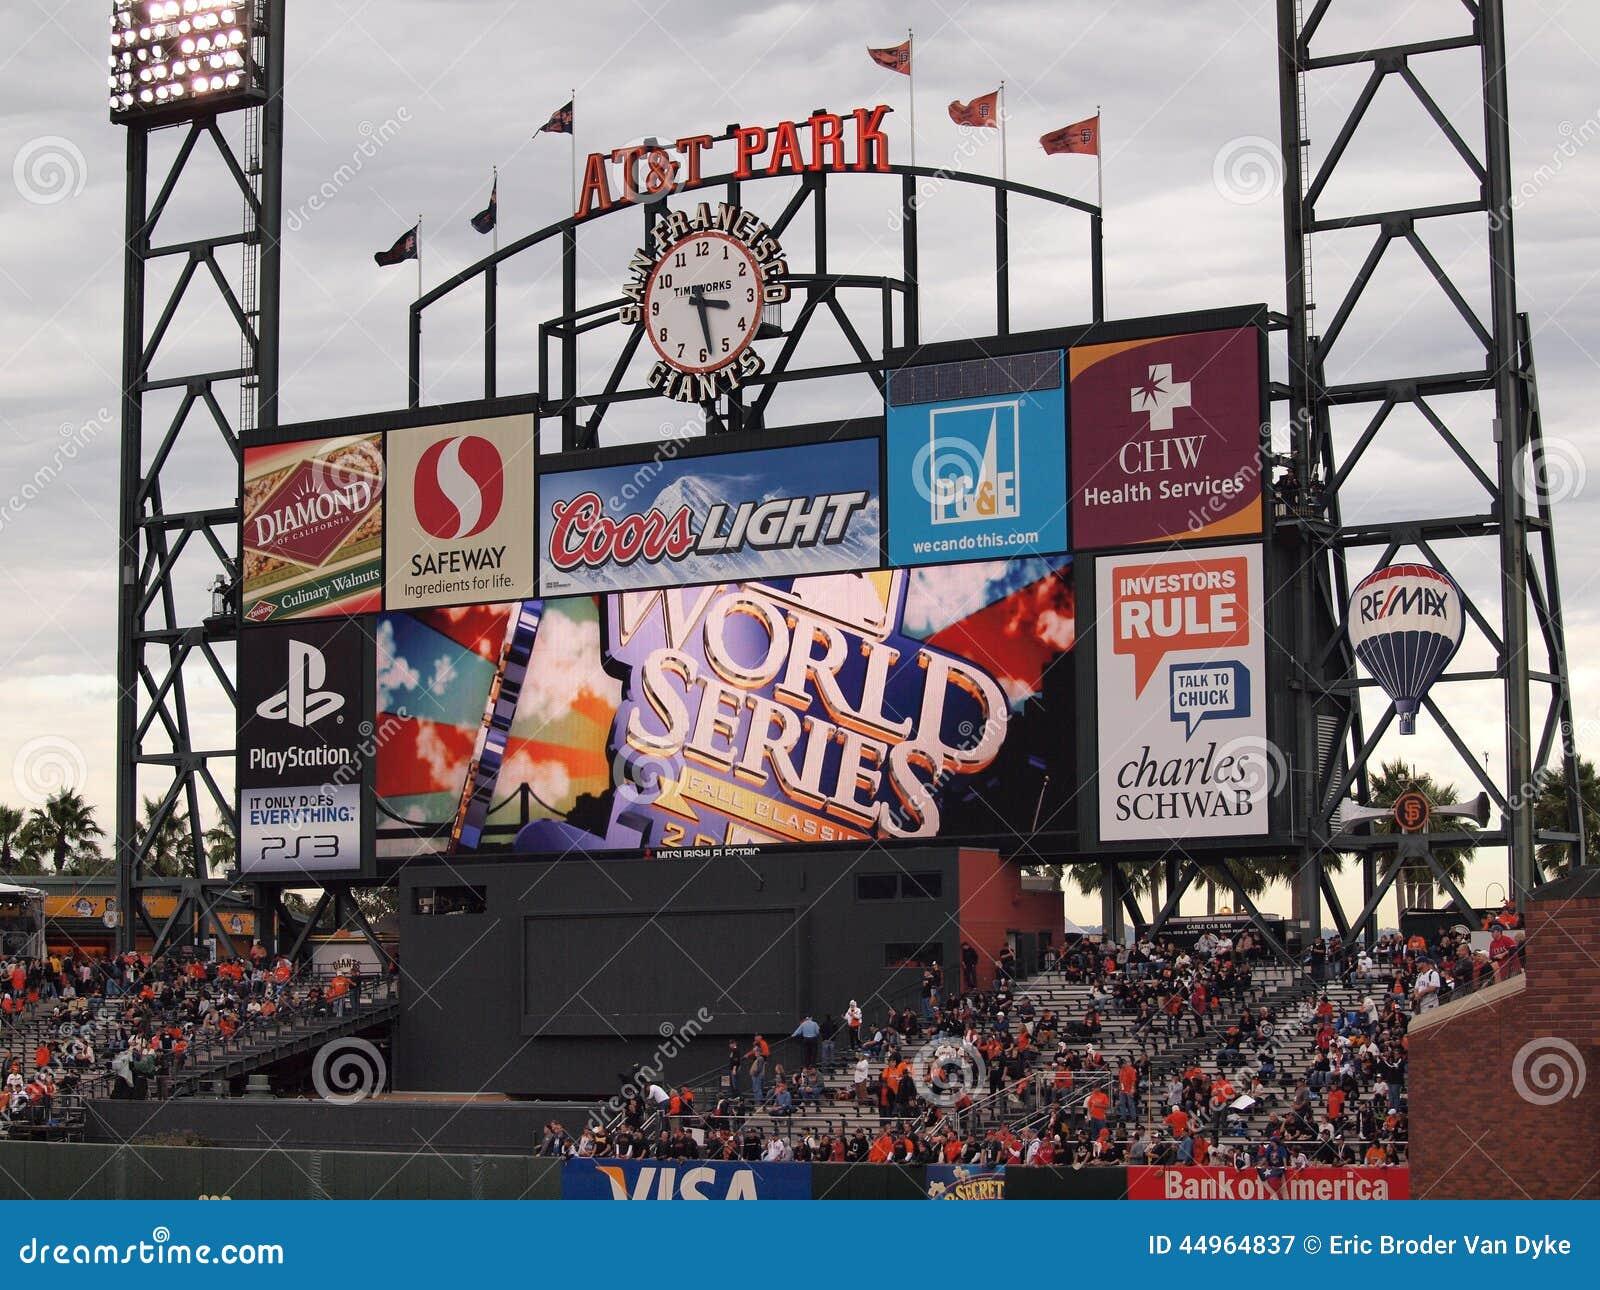 ATT Park HDTV Scoreboard in the outfield bleachers displays World Series logo